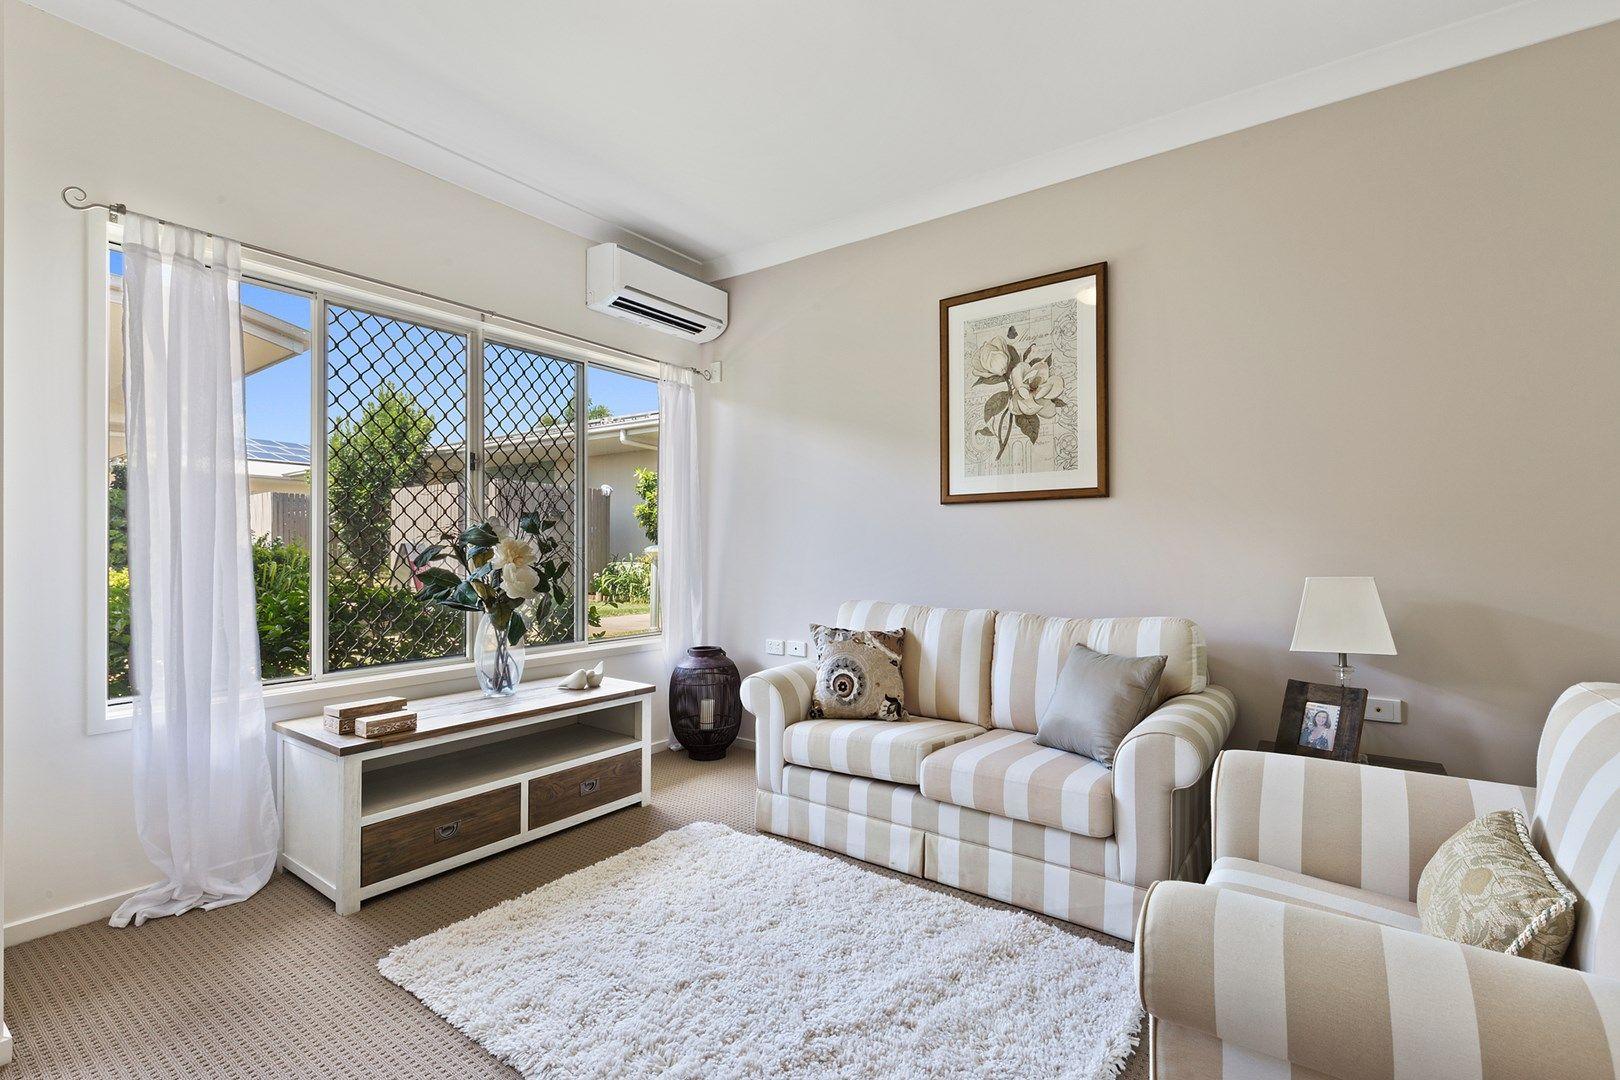 8/14 Pauline Martin Drive, Rockhampton City QLD 4700, Image 0